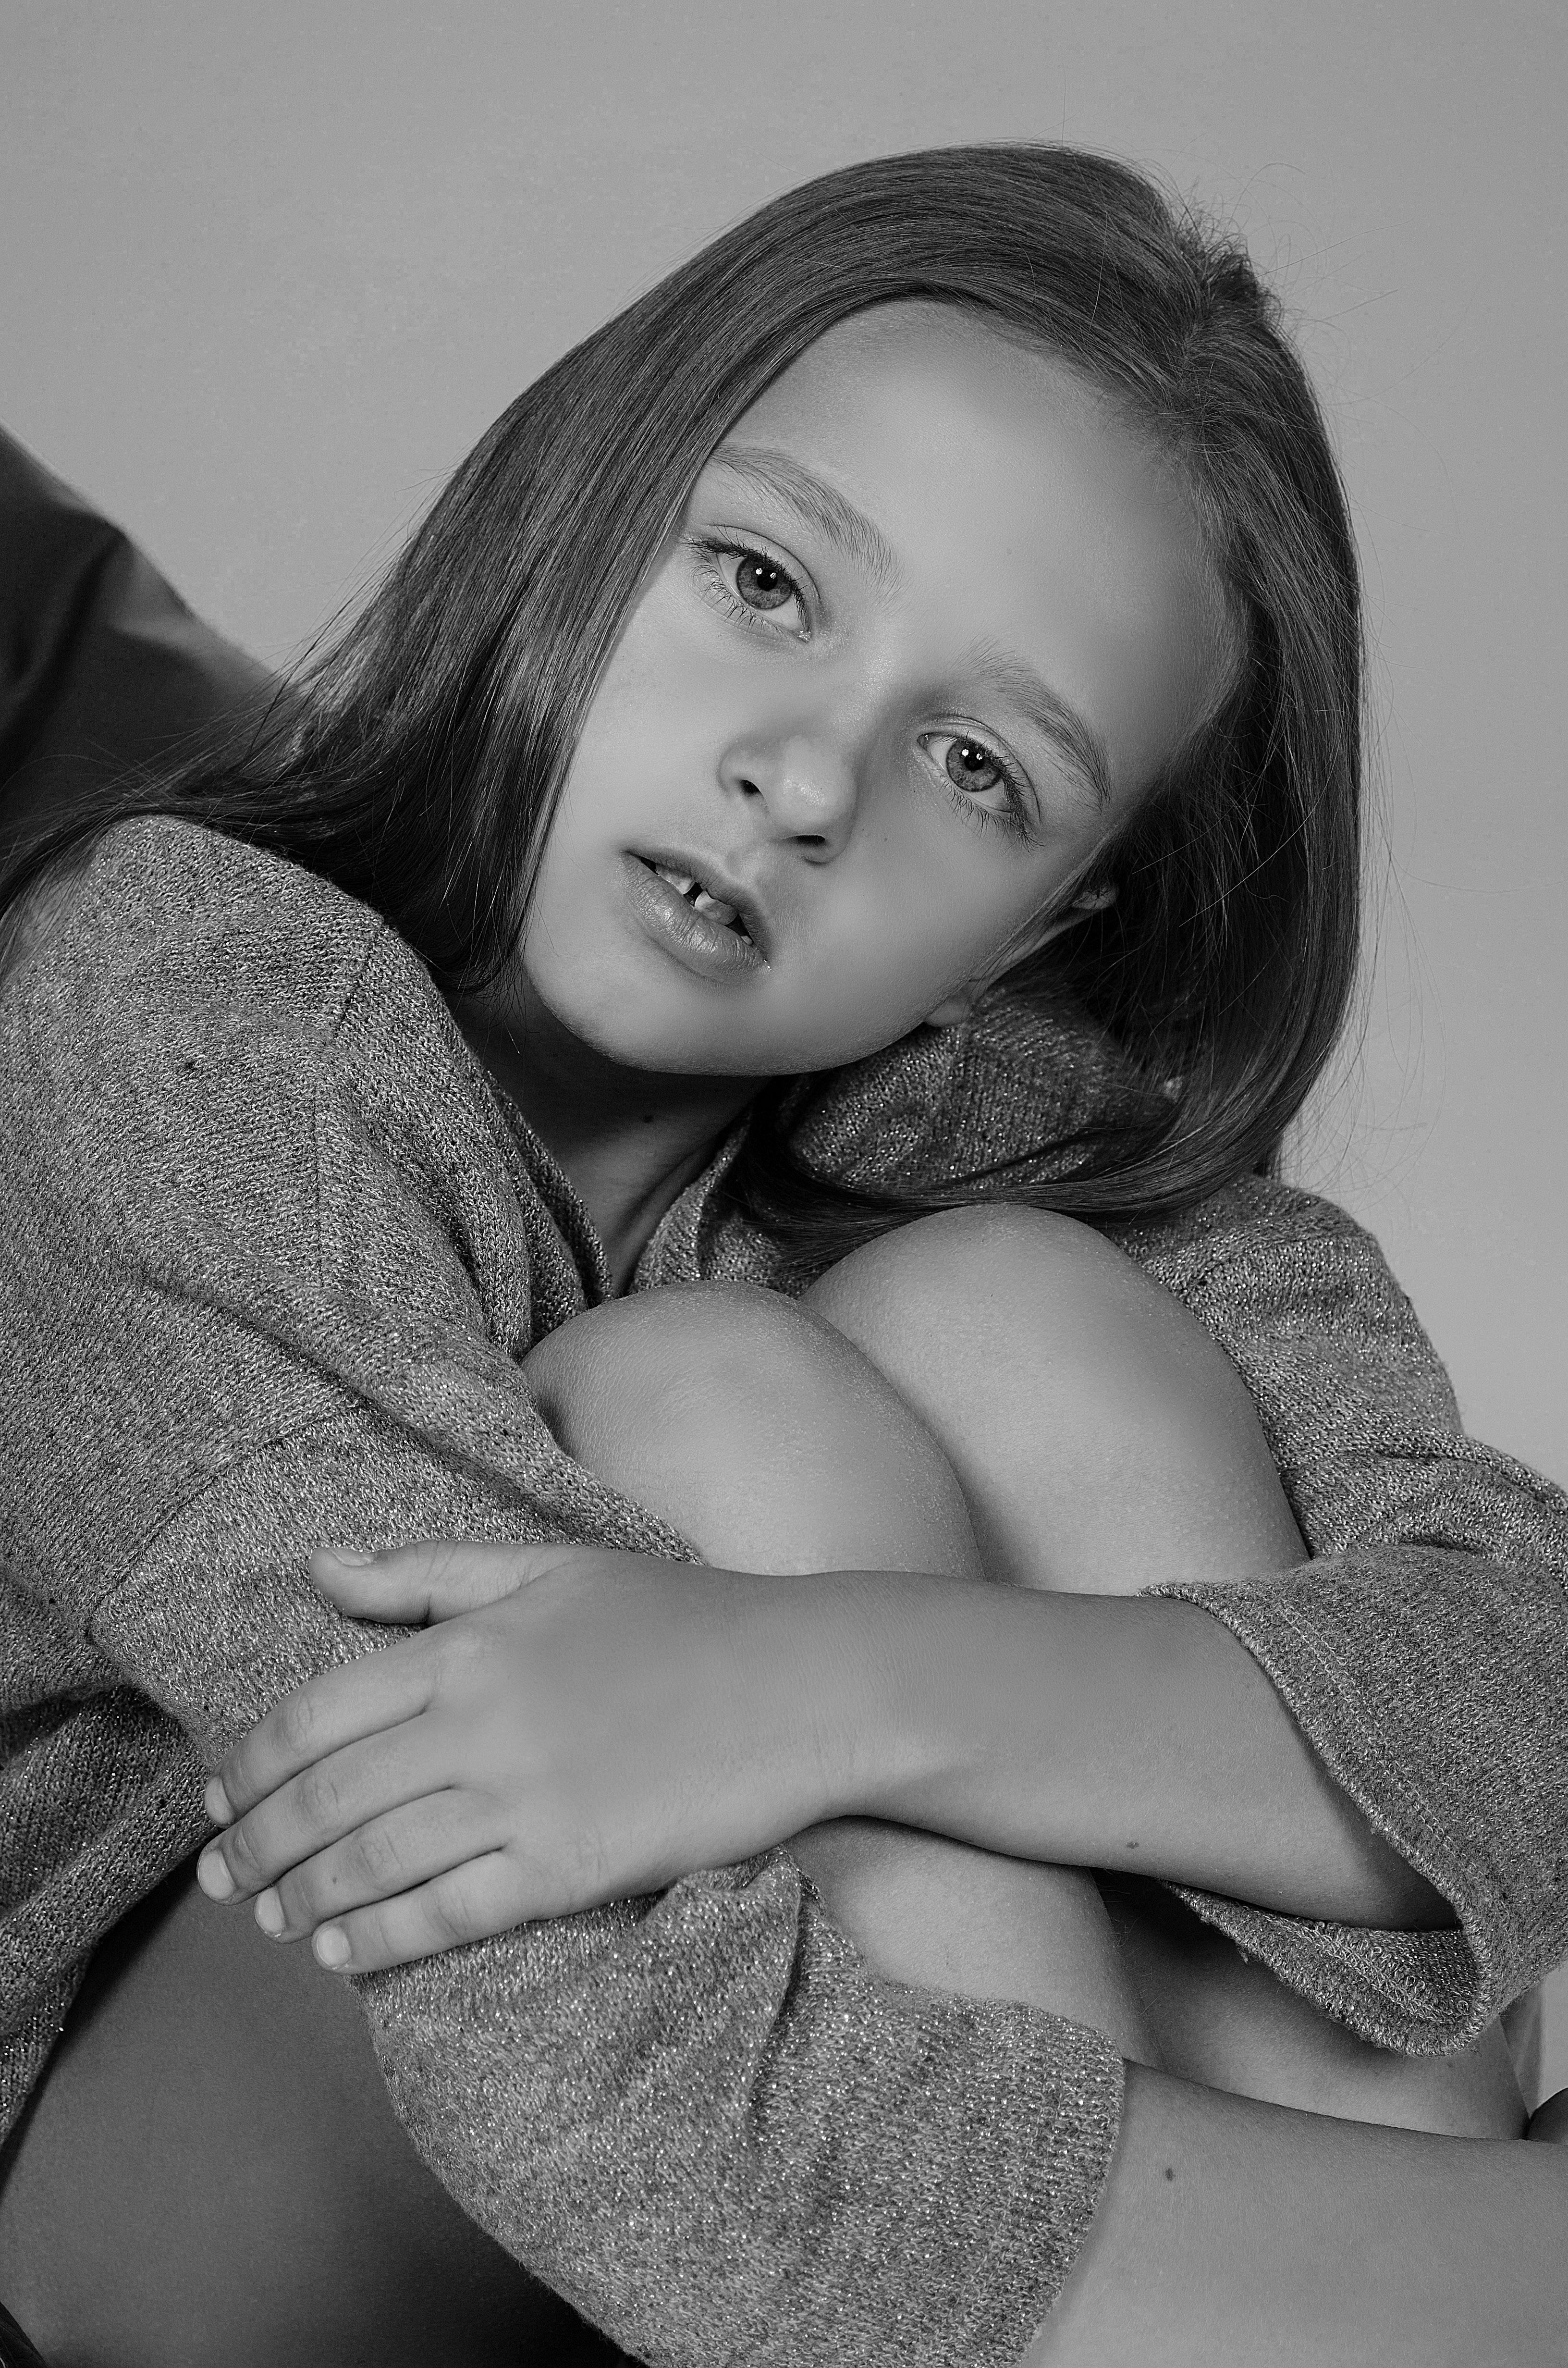 Ksenia Aleksakhina